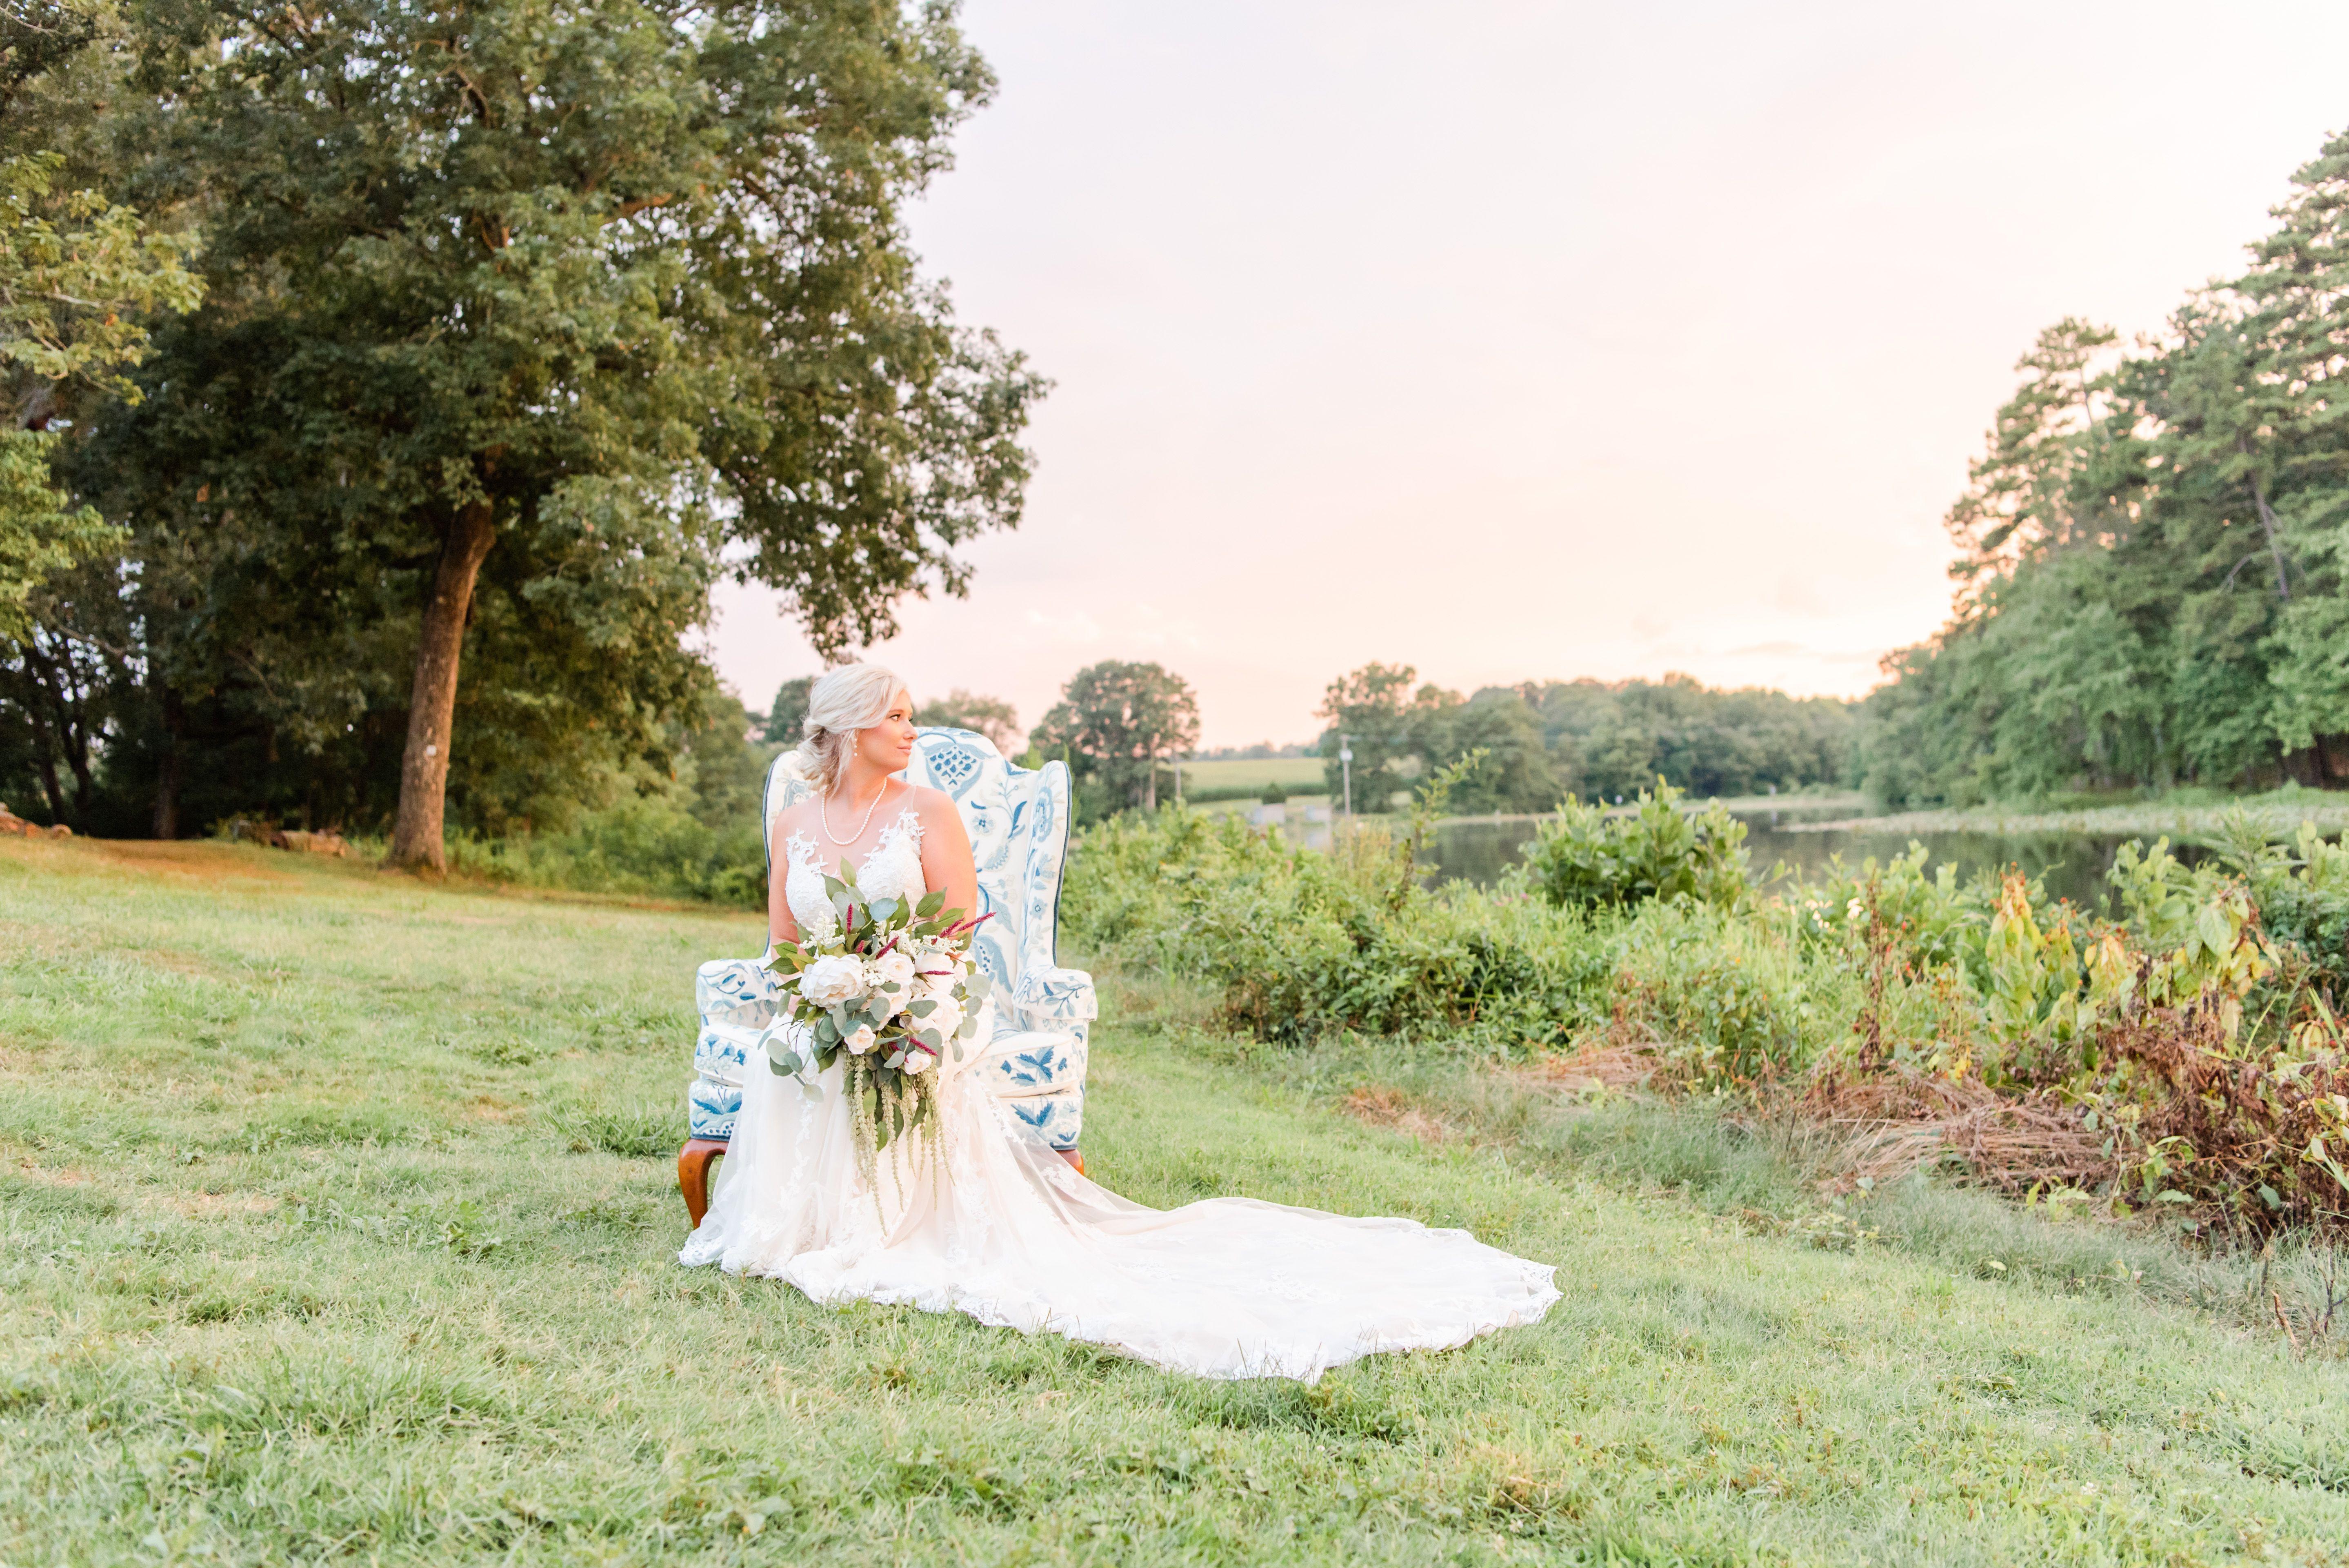 North Carolina Bridals Hickory Nc Tasha Barbour Photography Nc Wedding Photographer Nc Wedding Wedding Photographers Bridal Portraits